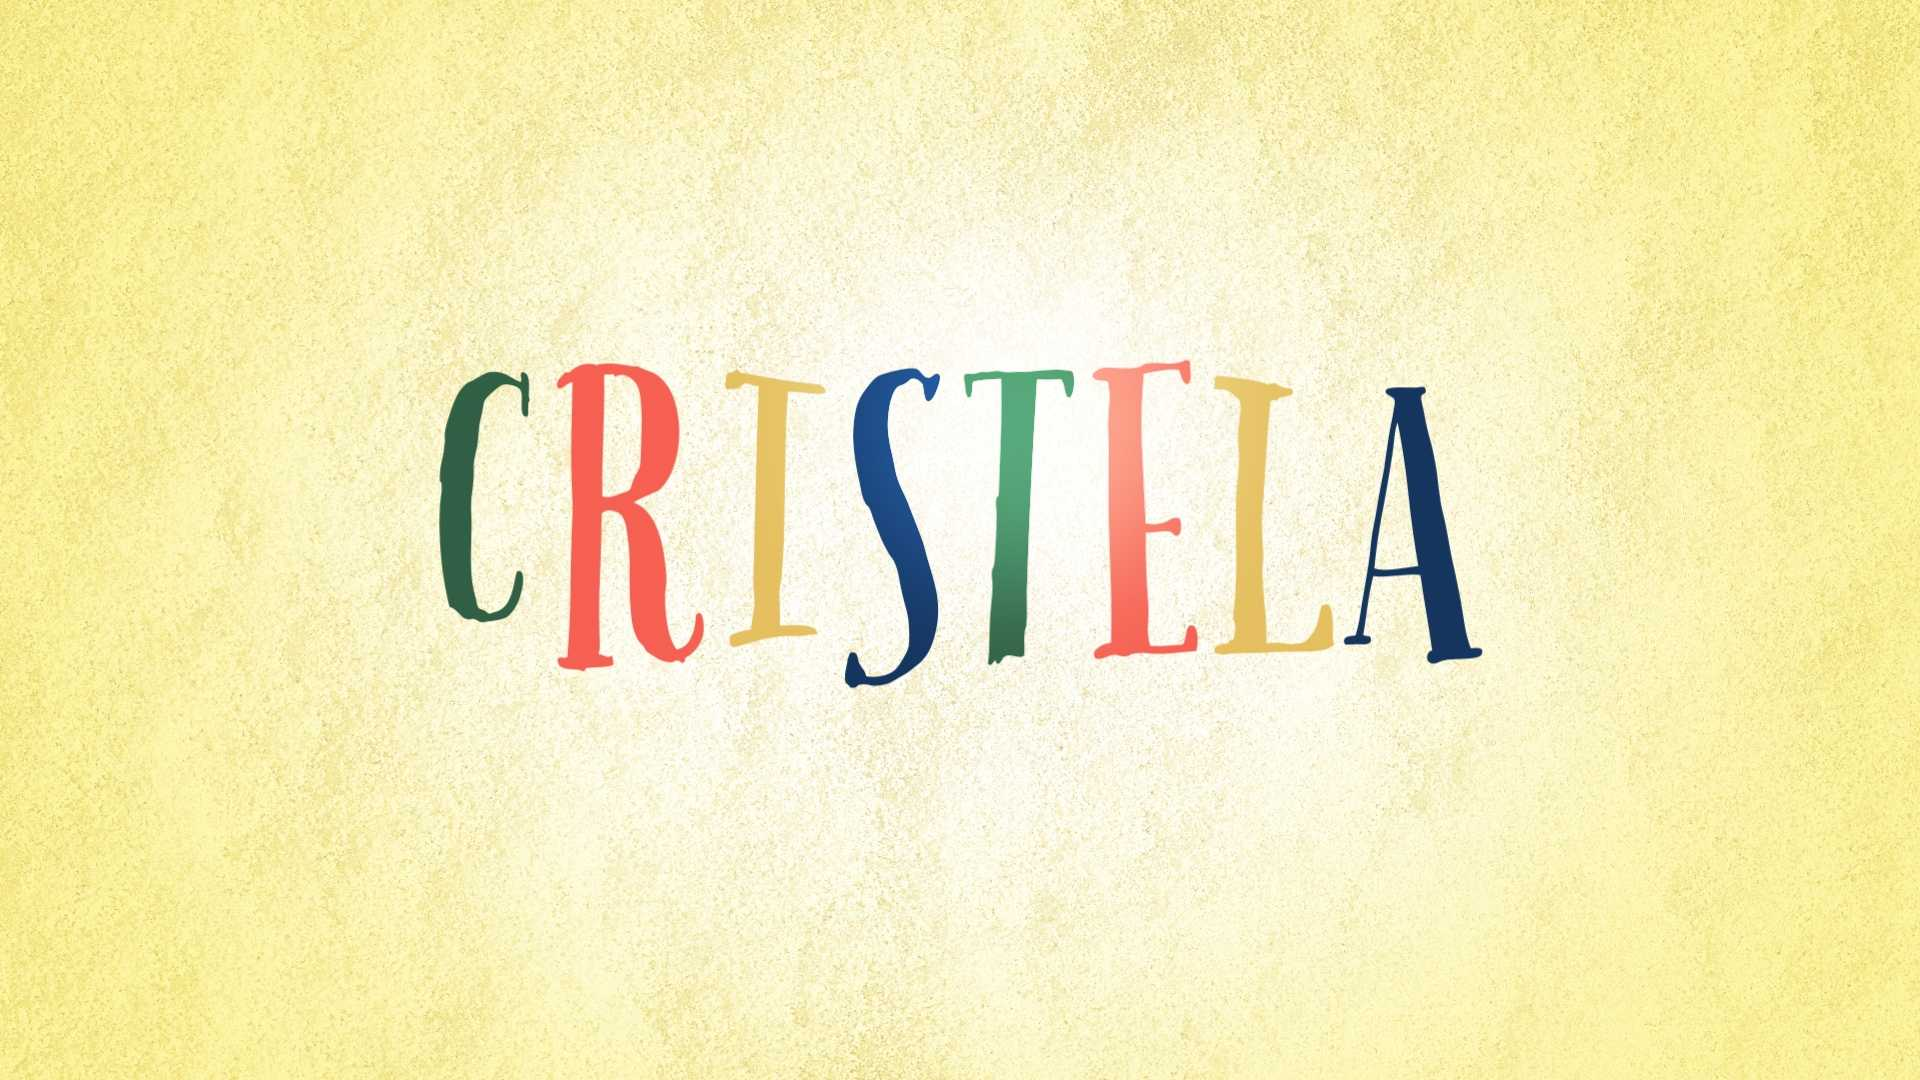 ABC Fall Preview: Cristela